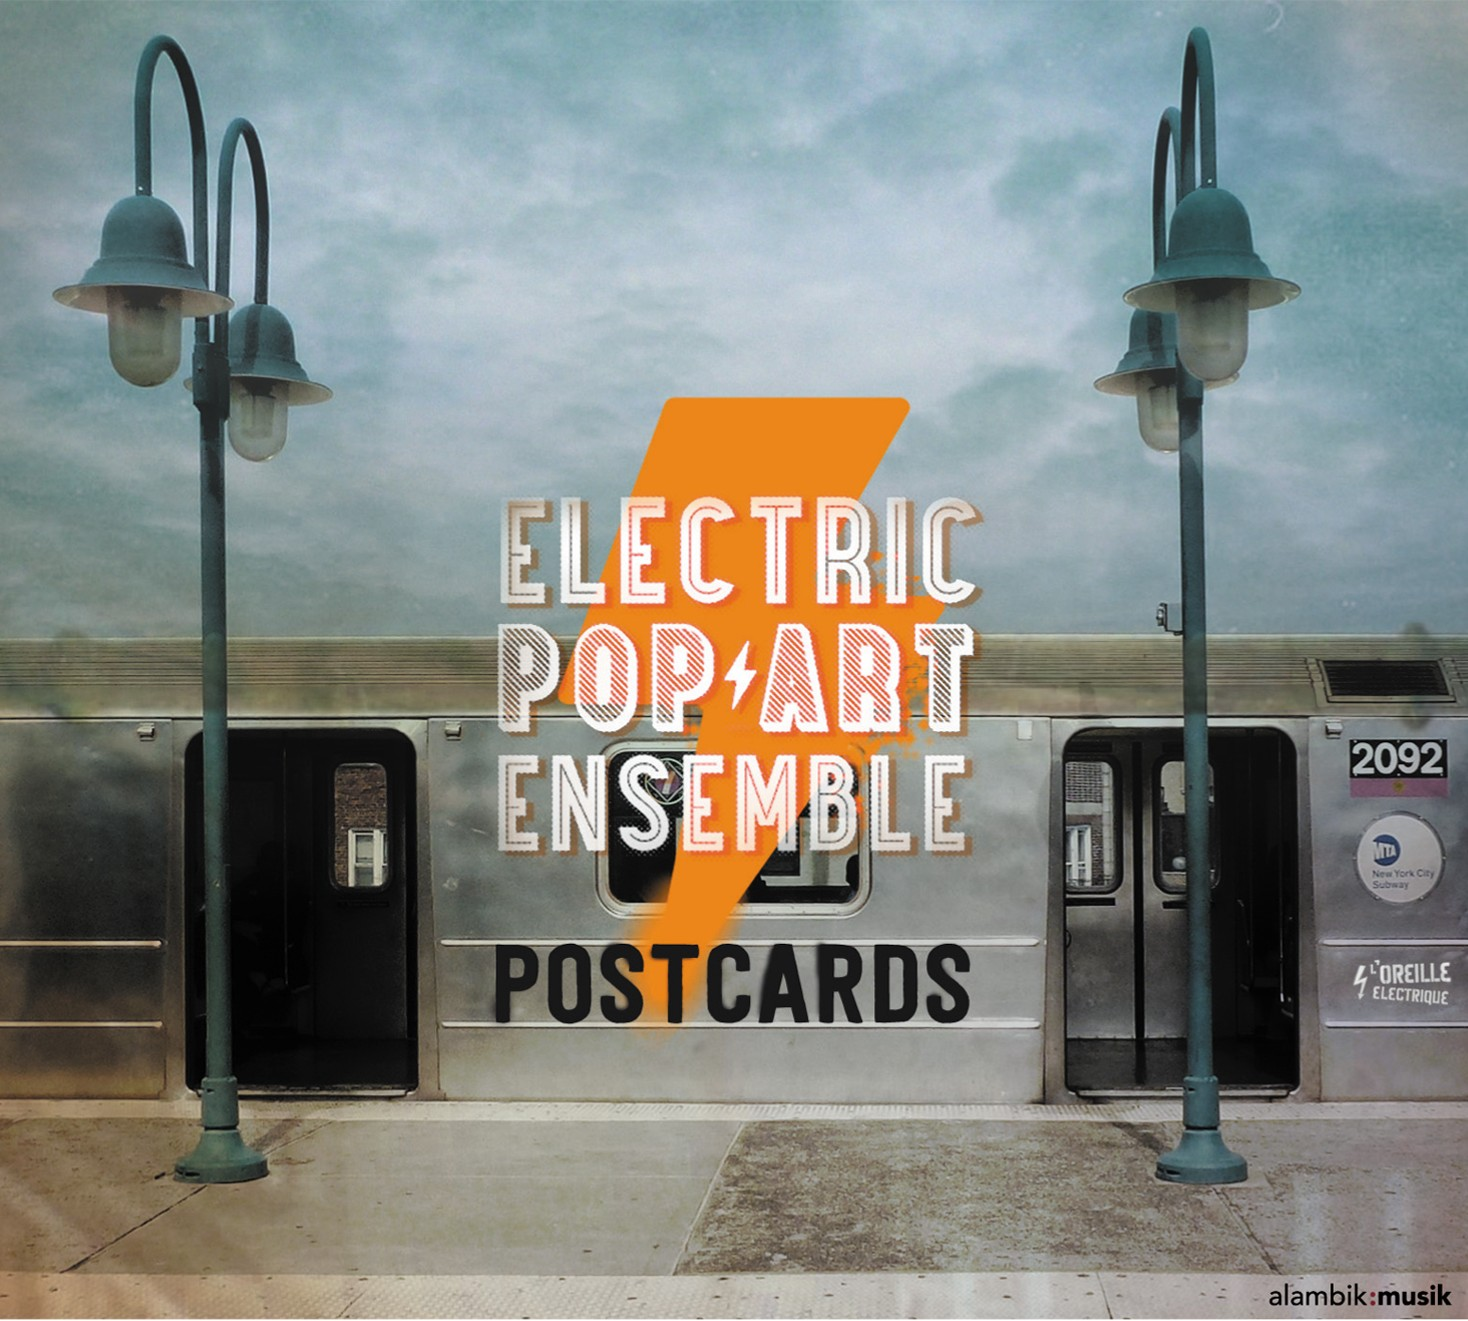 PostCardsWEB1-recto